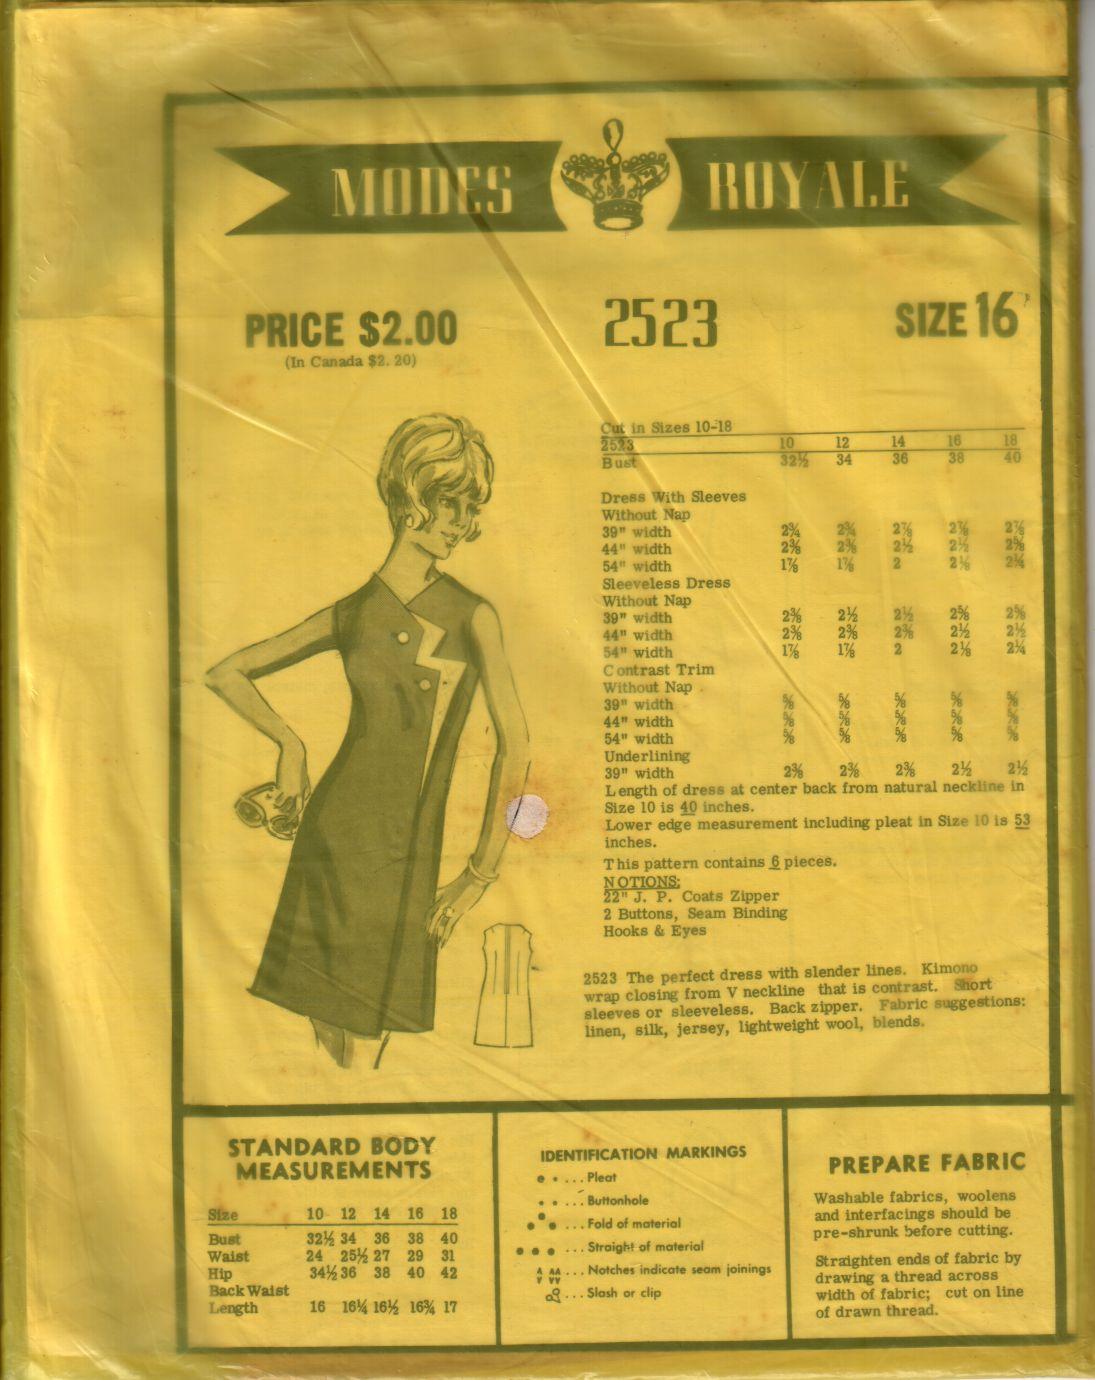 Modes Royale 2523